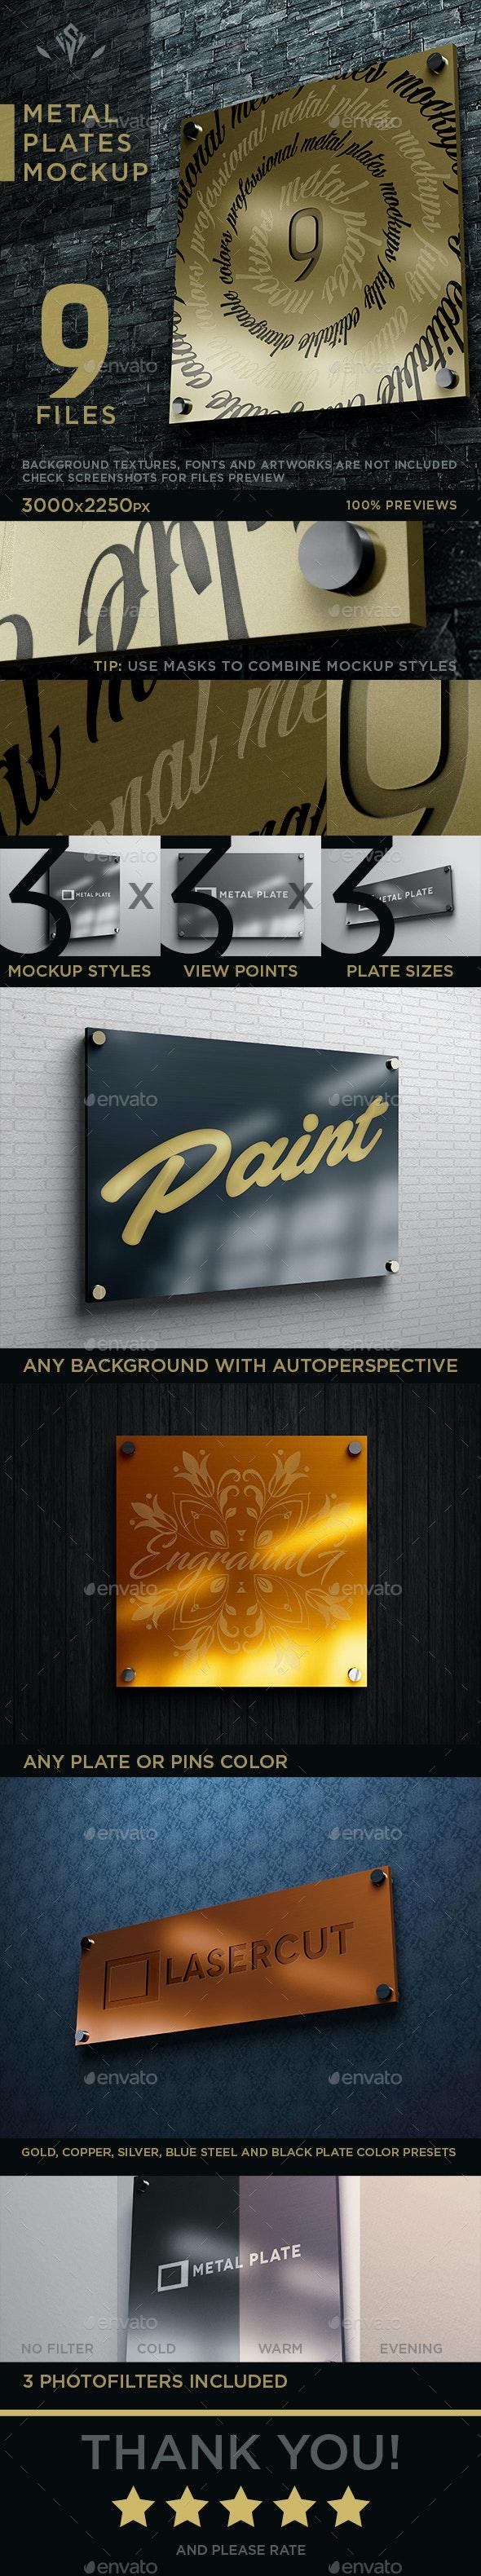 9 Metal Plates Mockup - Logo Product Mock-Ups